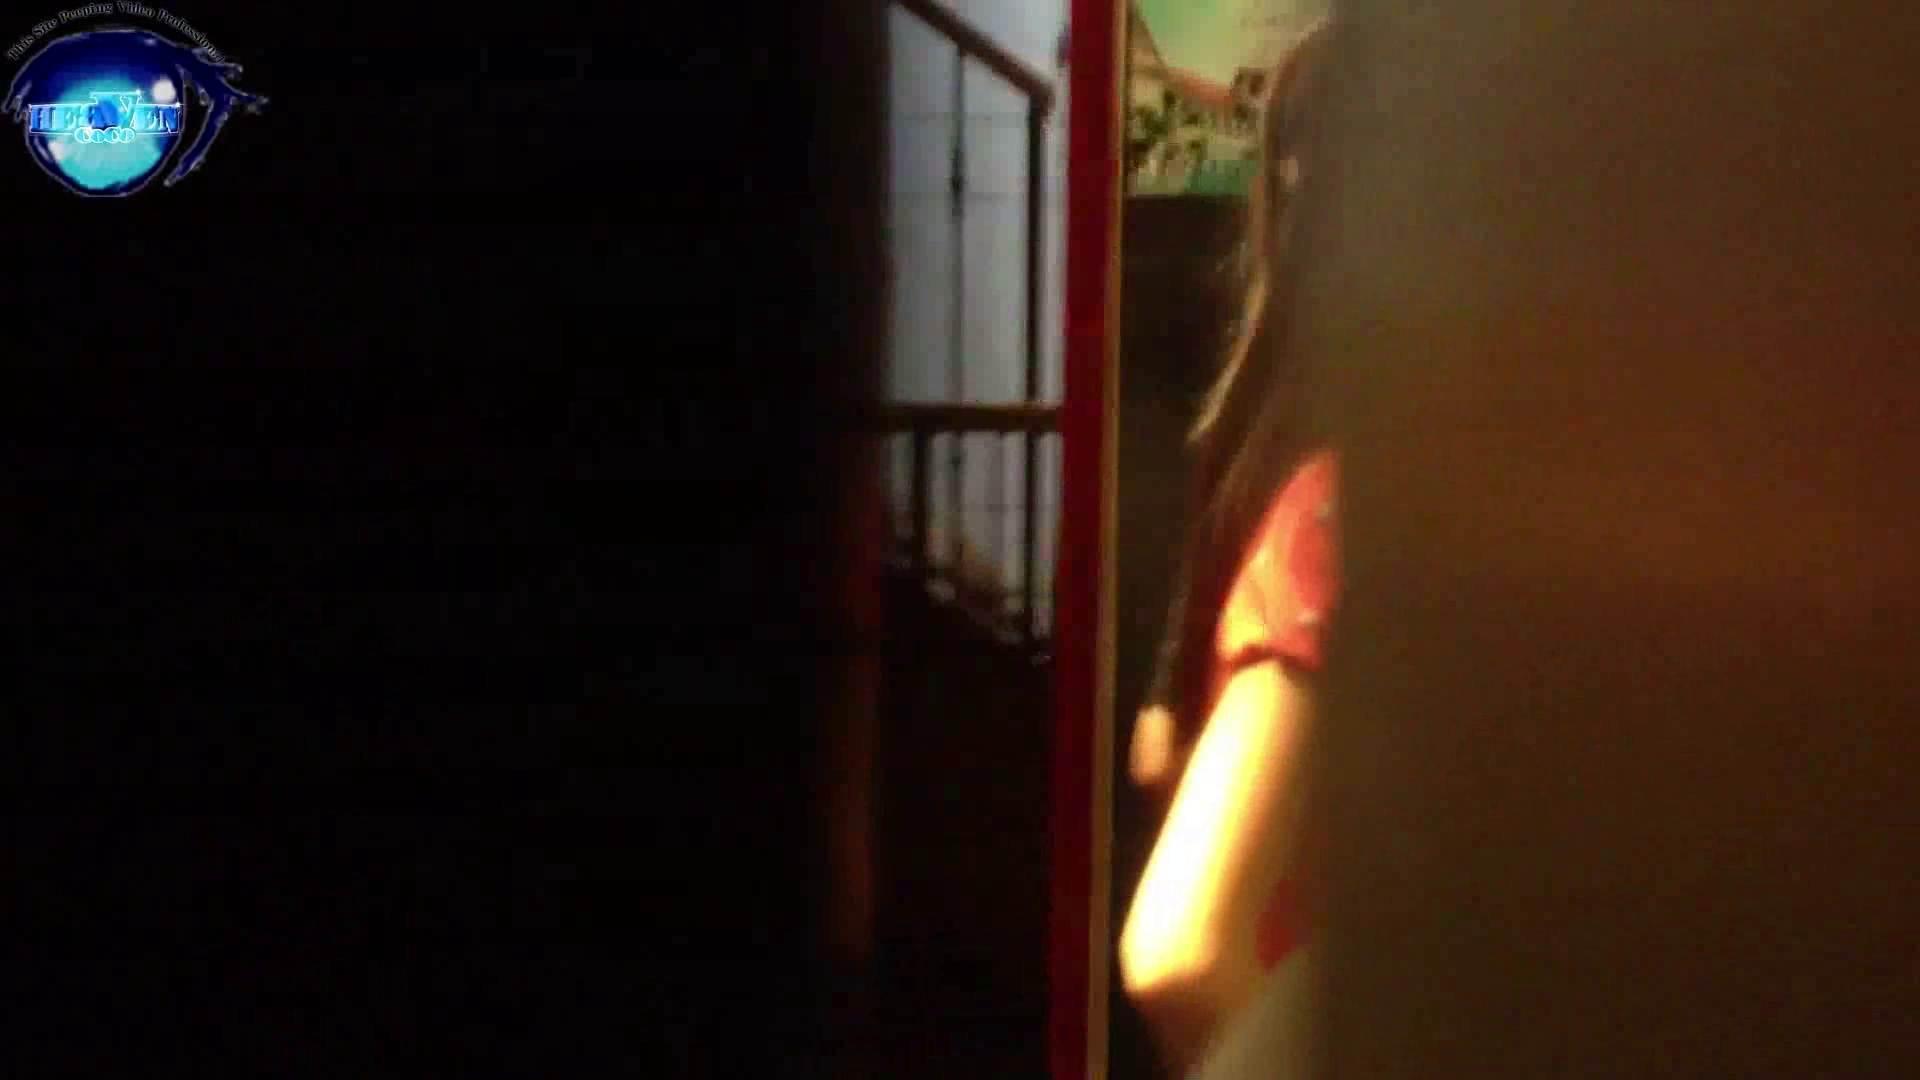 GOD HAND ファッションショッピングセンター盗撮vol.02前編 盗撮 ワレメ無修正動画無料 74連発 74